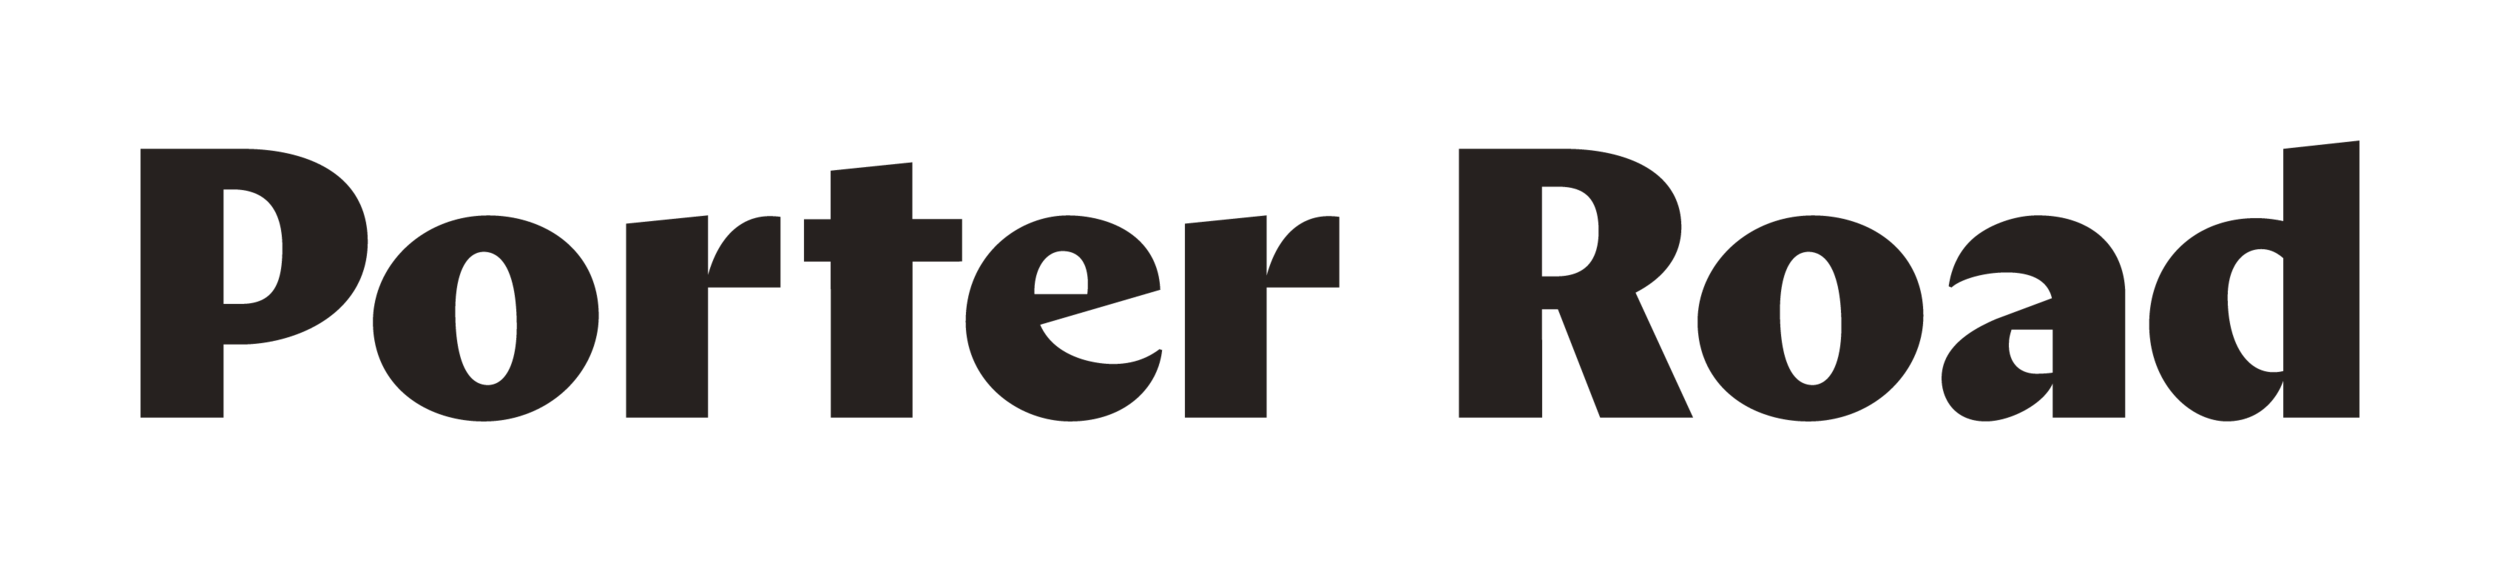 Porter Road